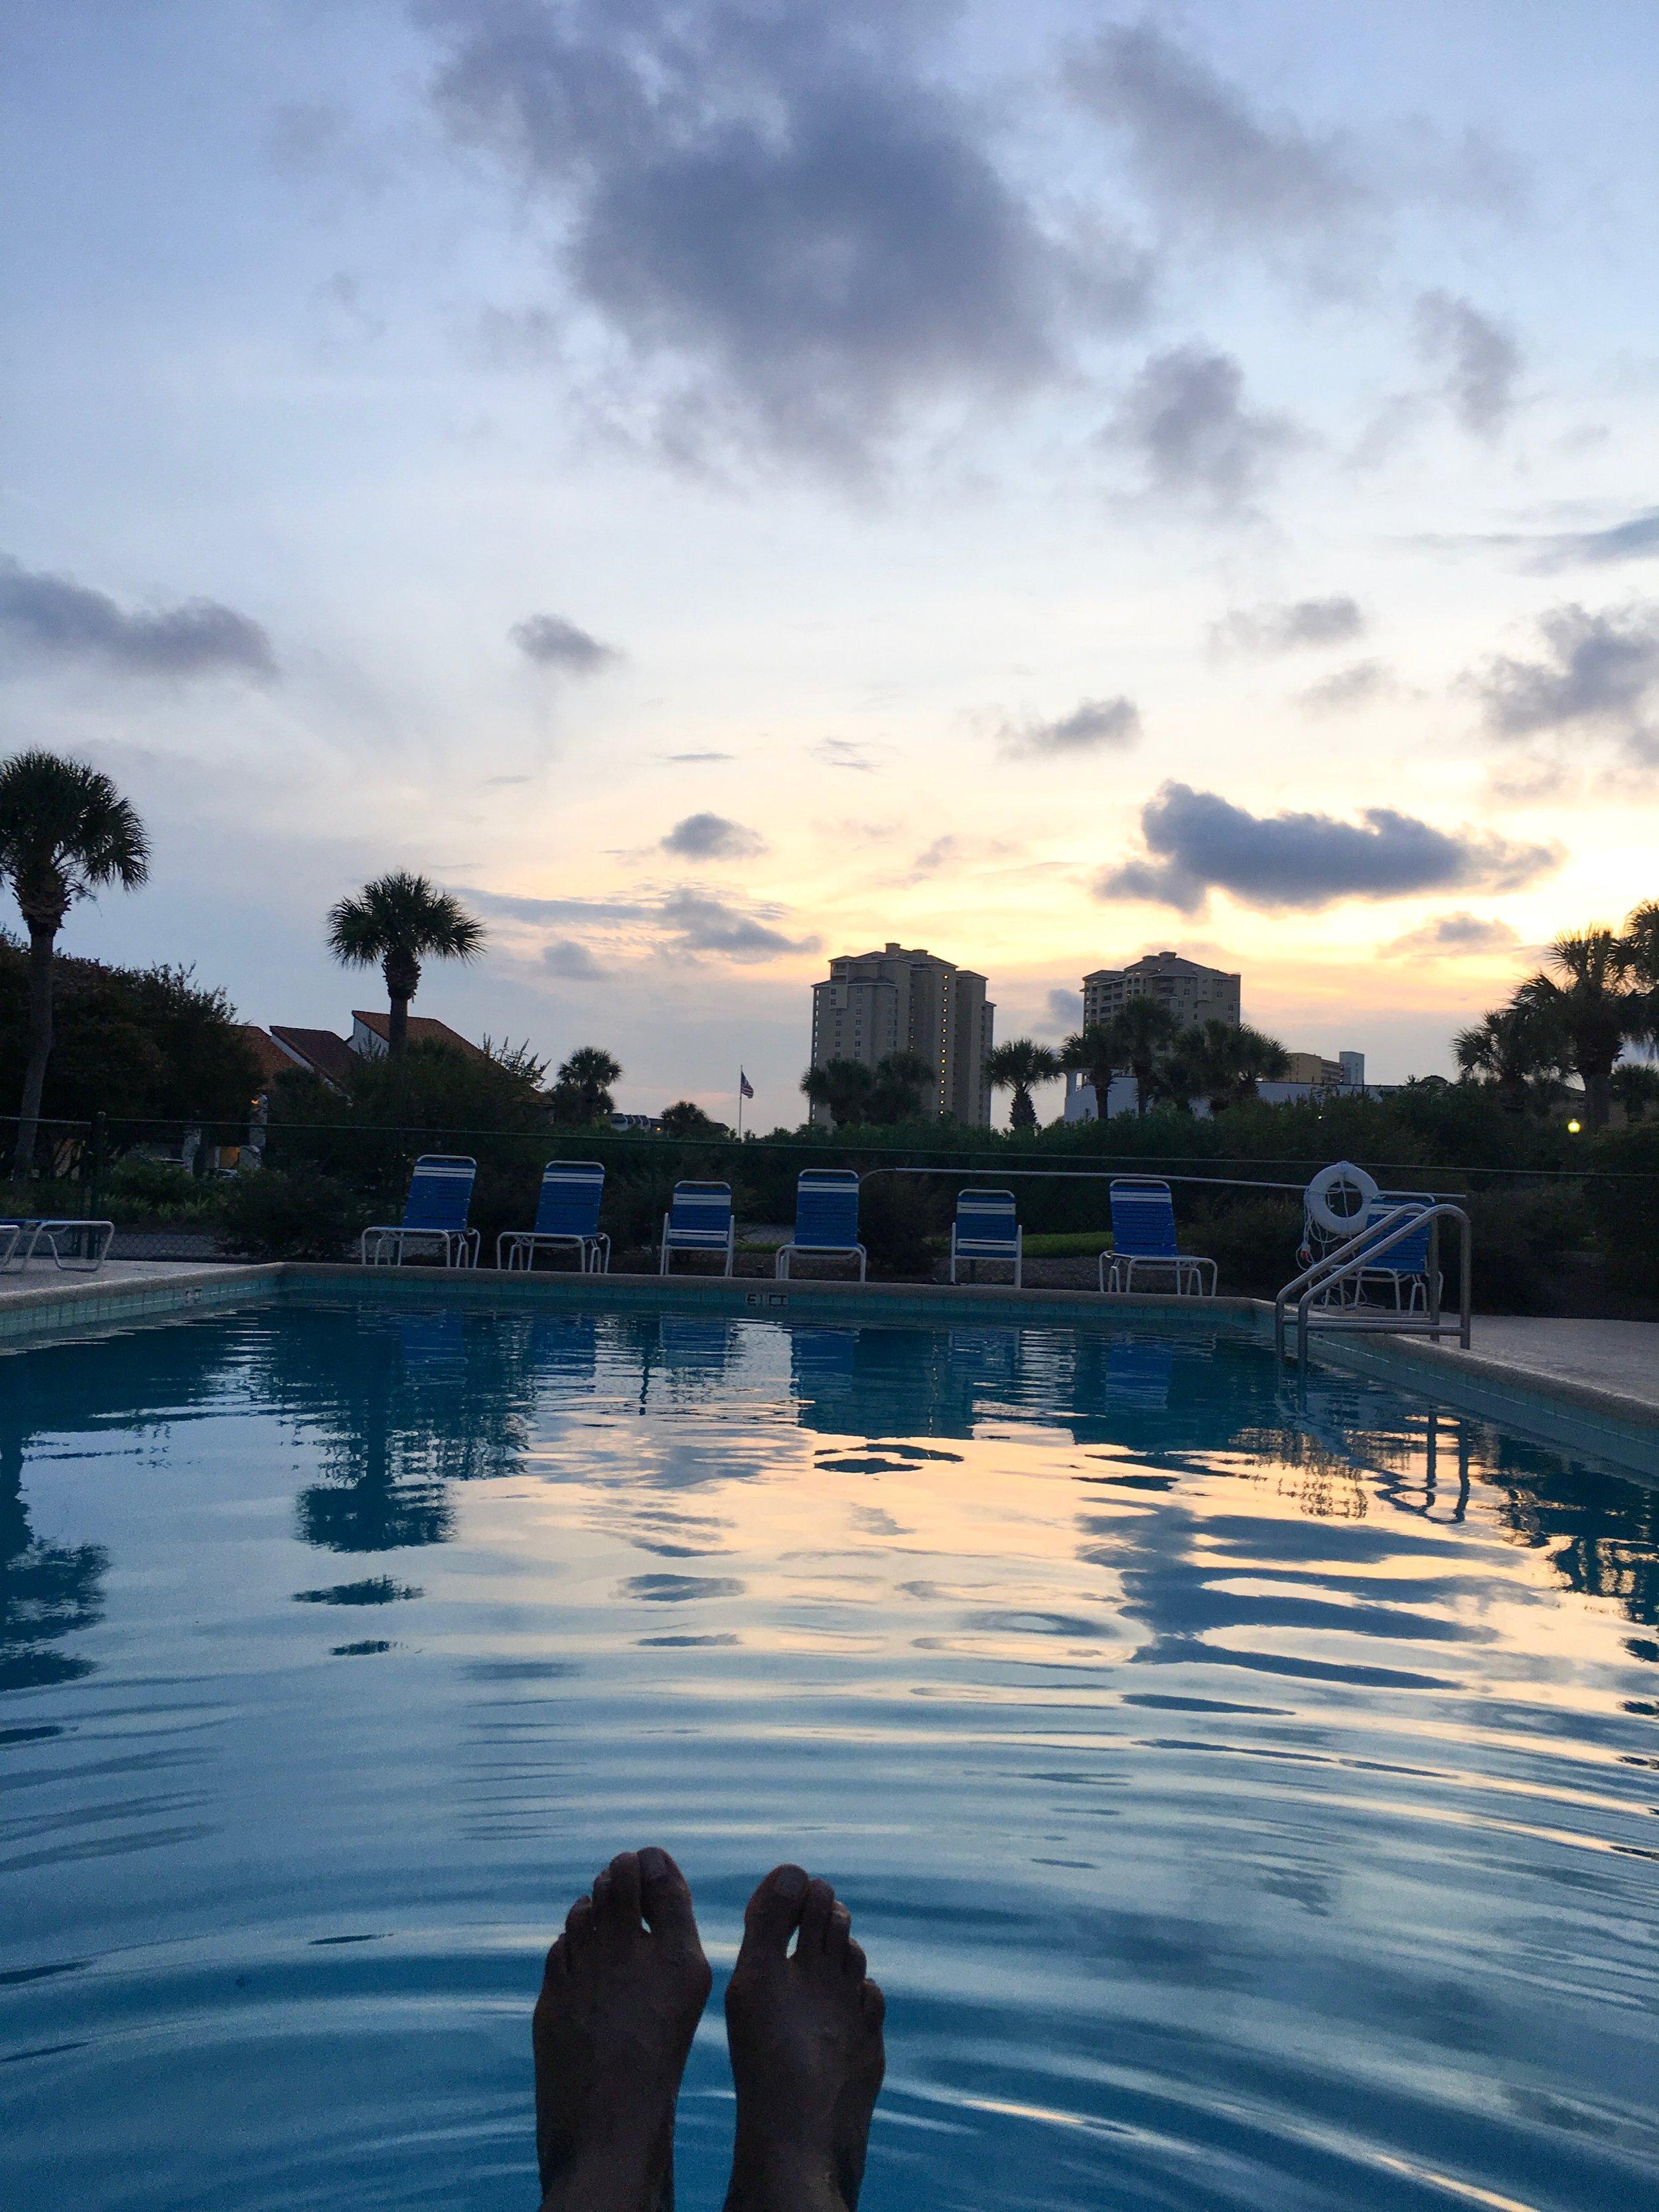 Learn the advantages of solo travel. Read more about the advantages of solo travel here >>  https://krodcollective.com/blog/advantagestosolotravel